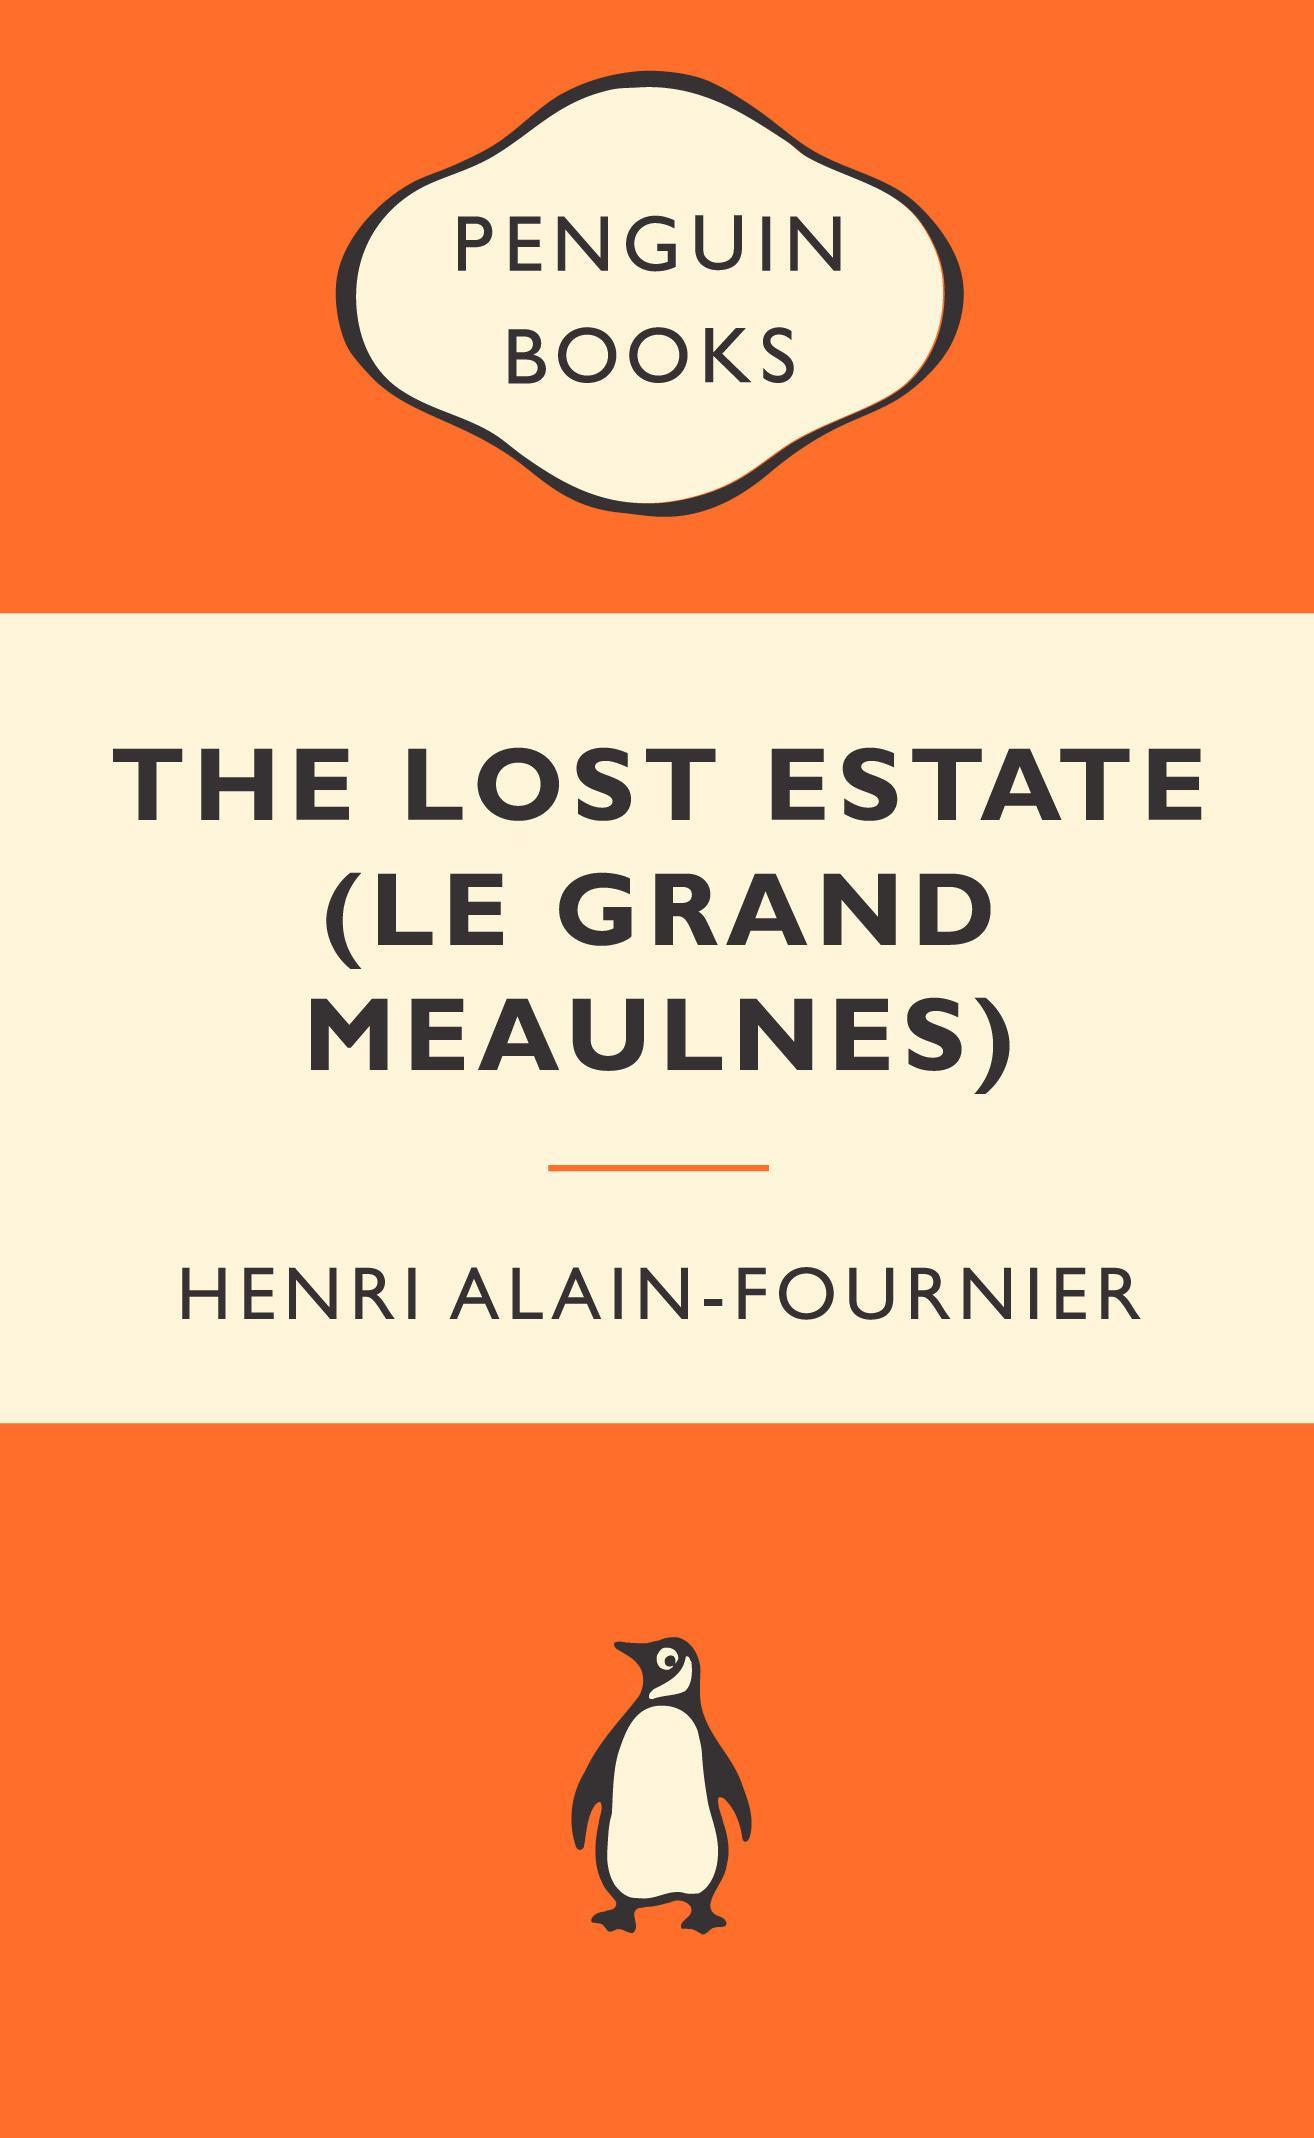 The Lost Estate (LeGrandMeaulnes)